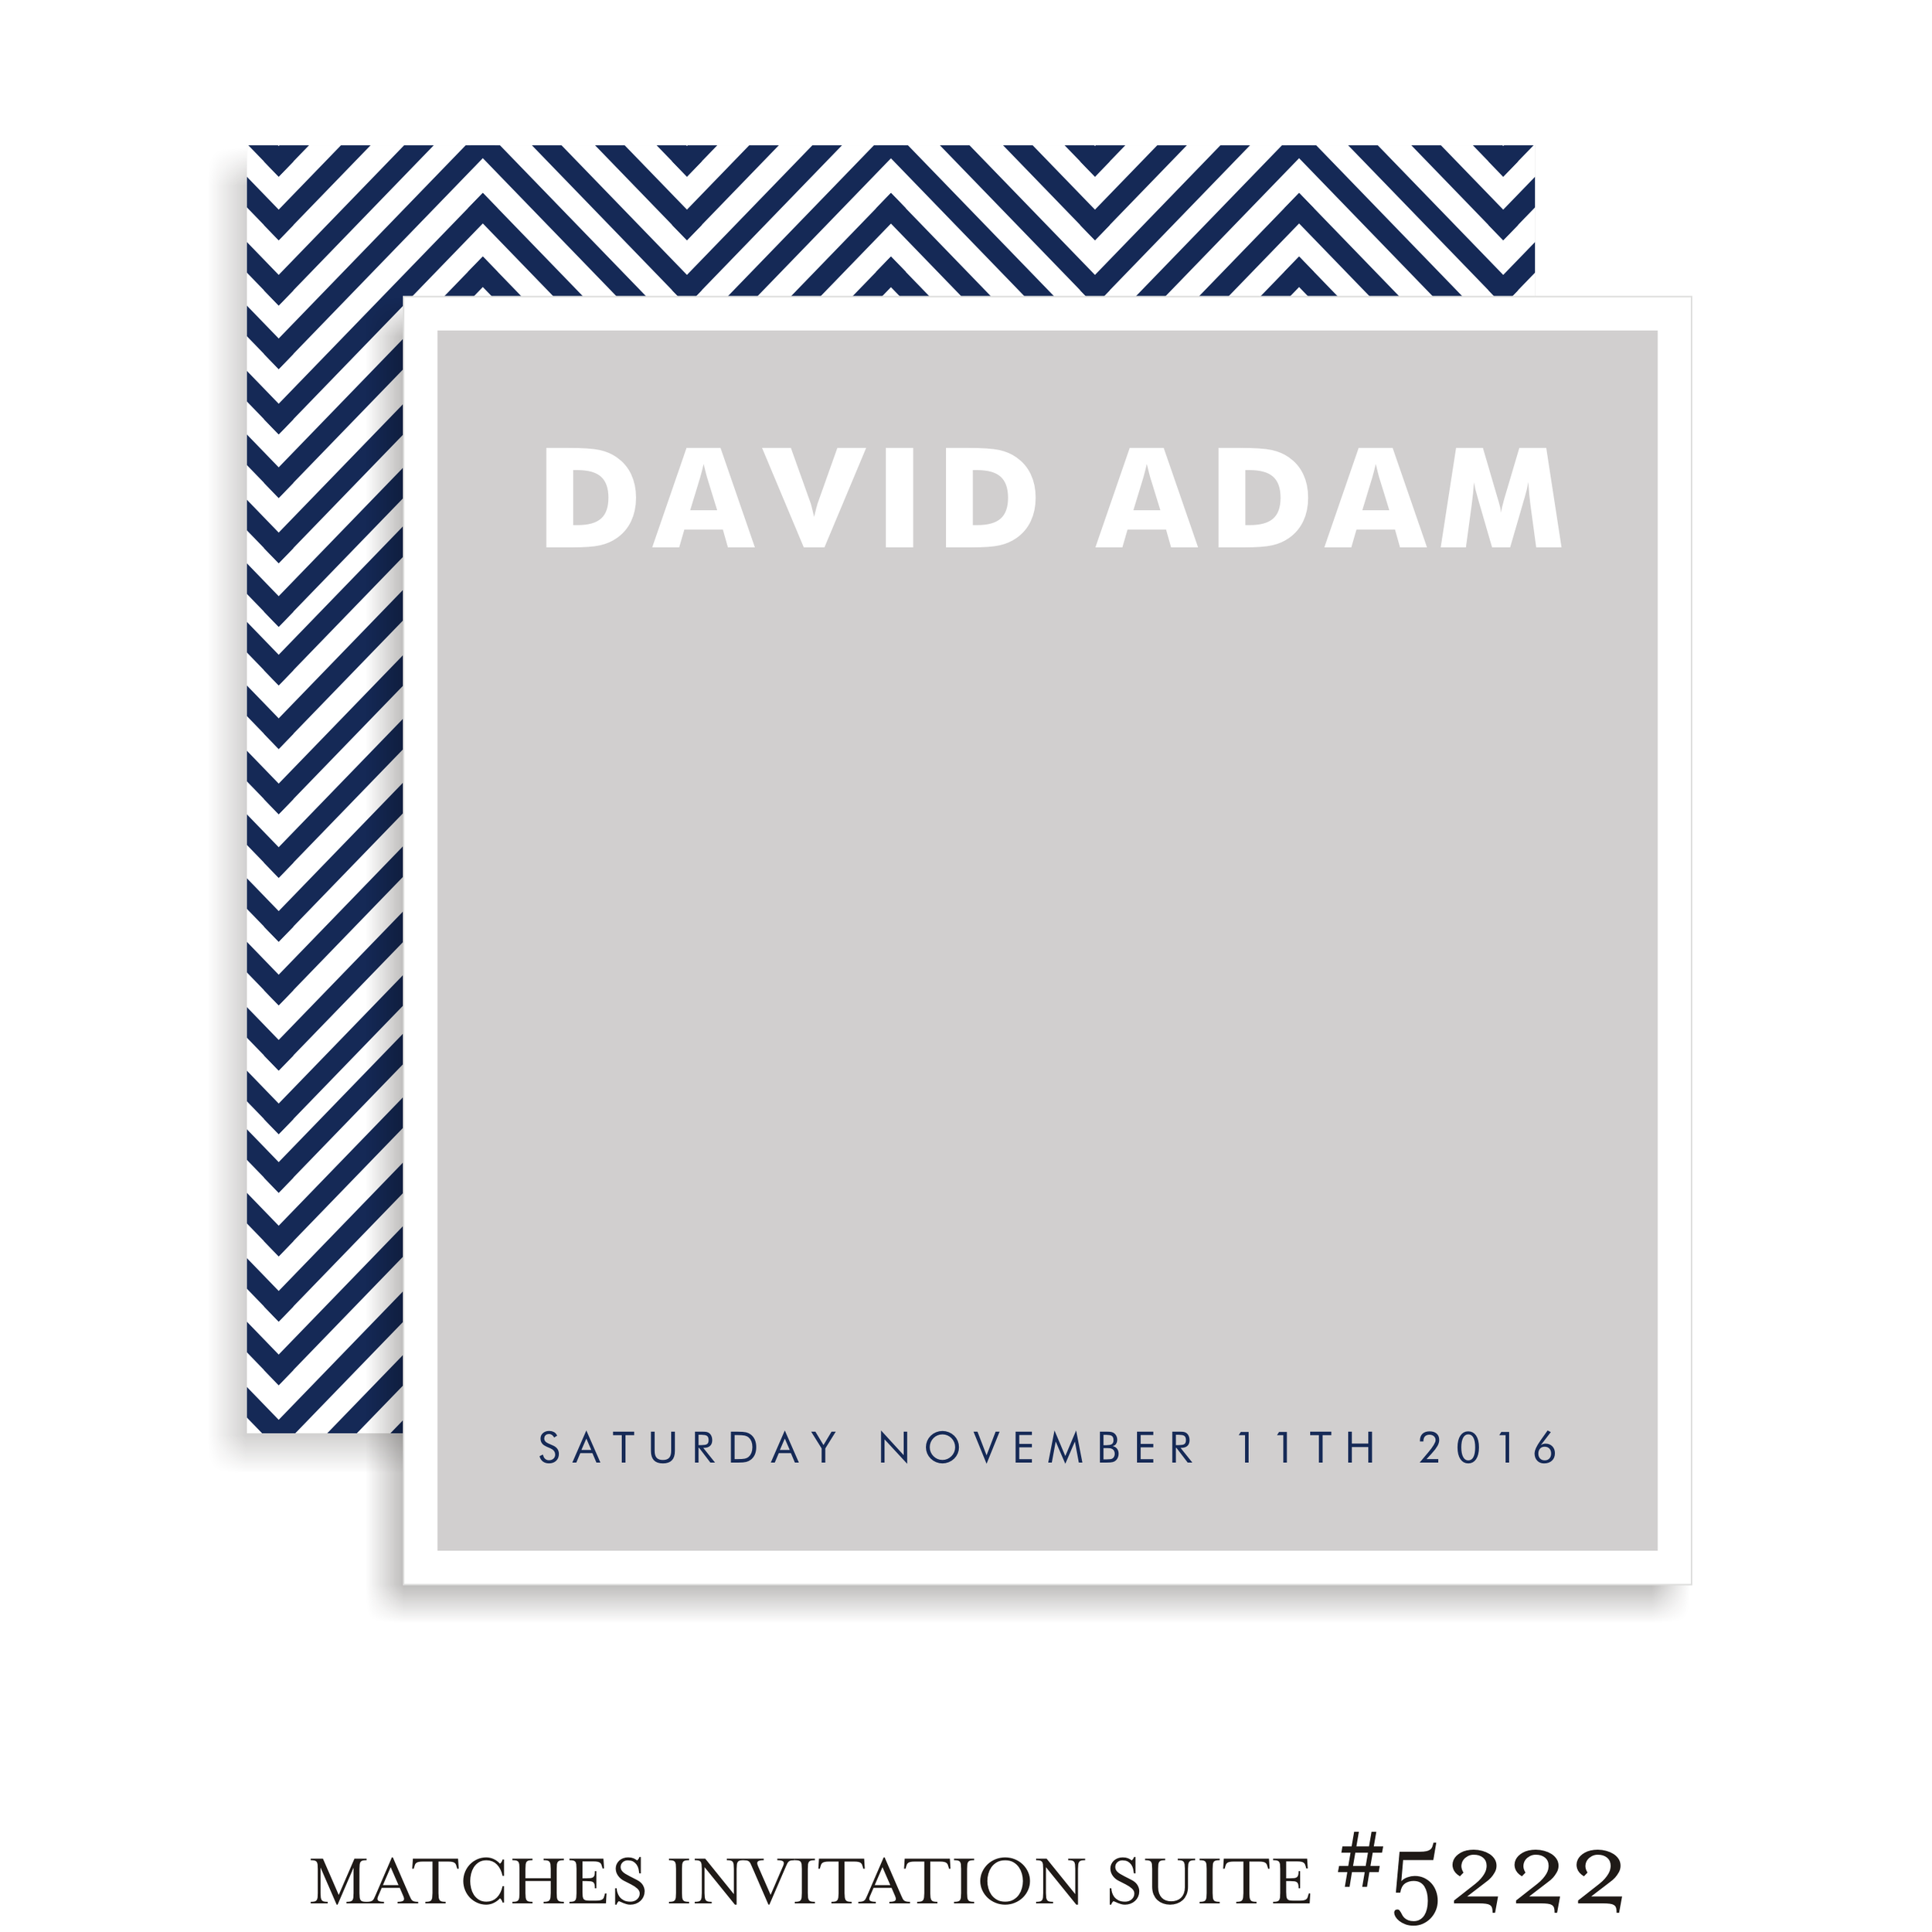 Sign In Board Bar Mitzvah Suite 5222 - David Adam